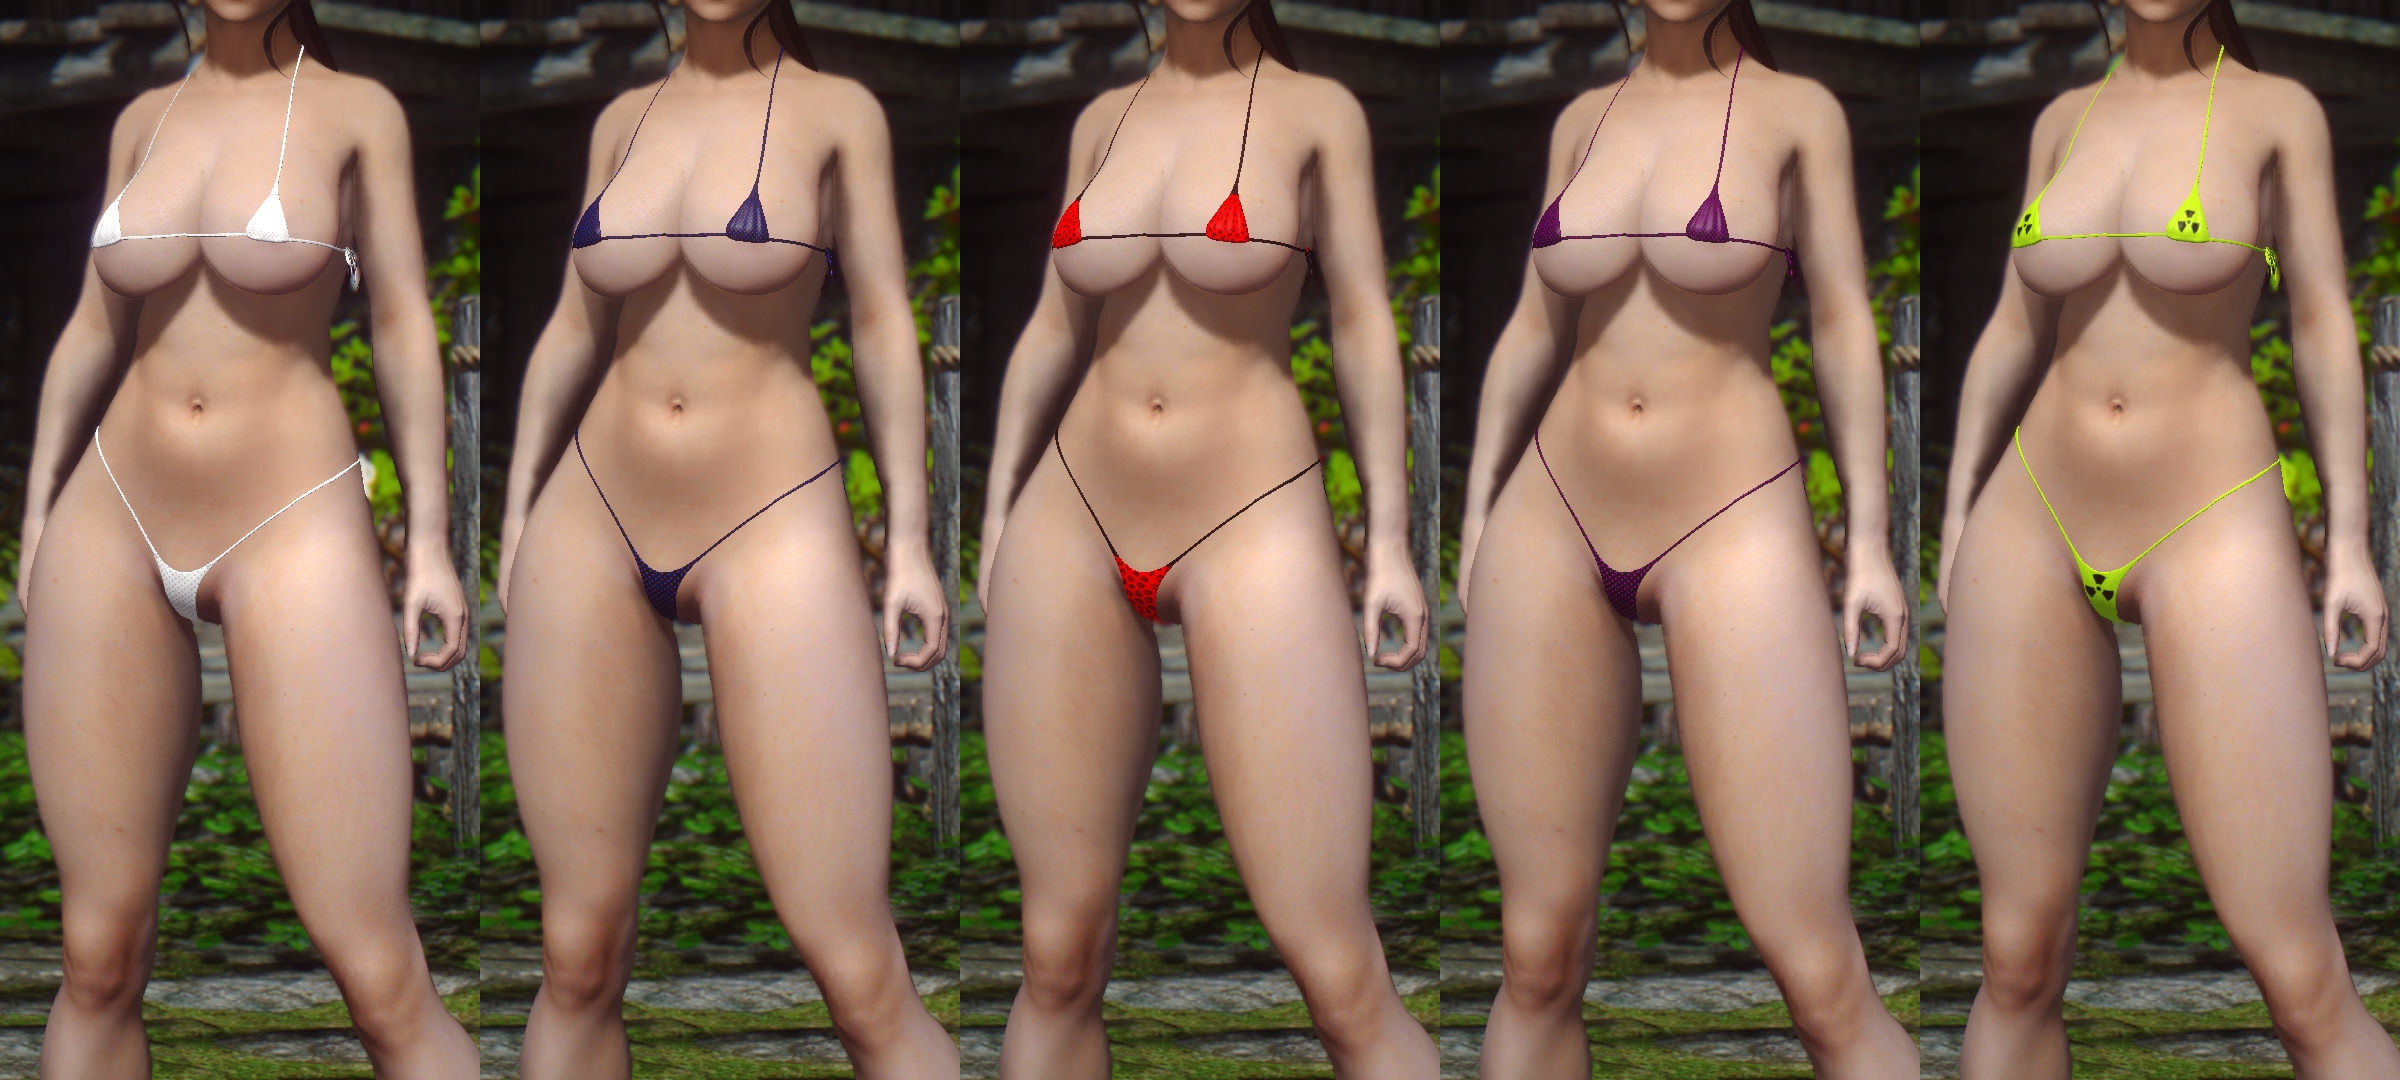 Daz_Bikini_Collection_2_7BO_10.jpg